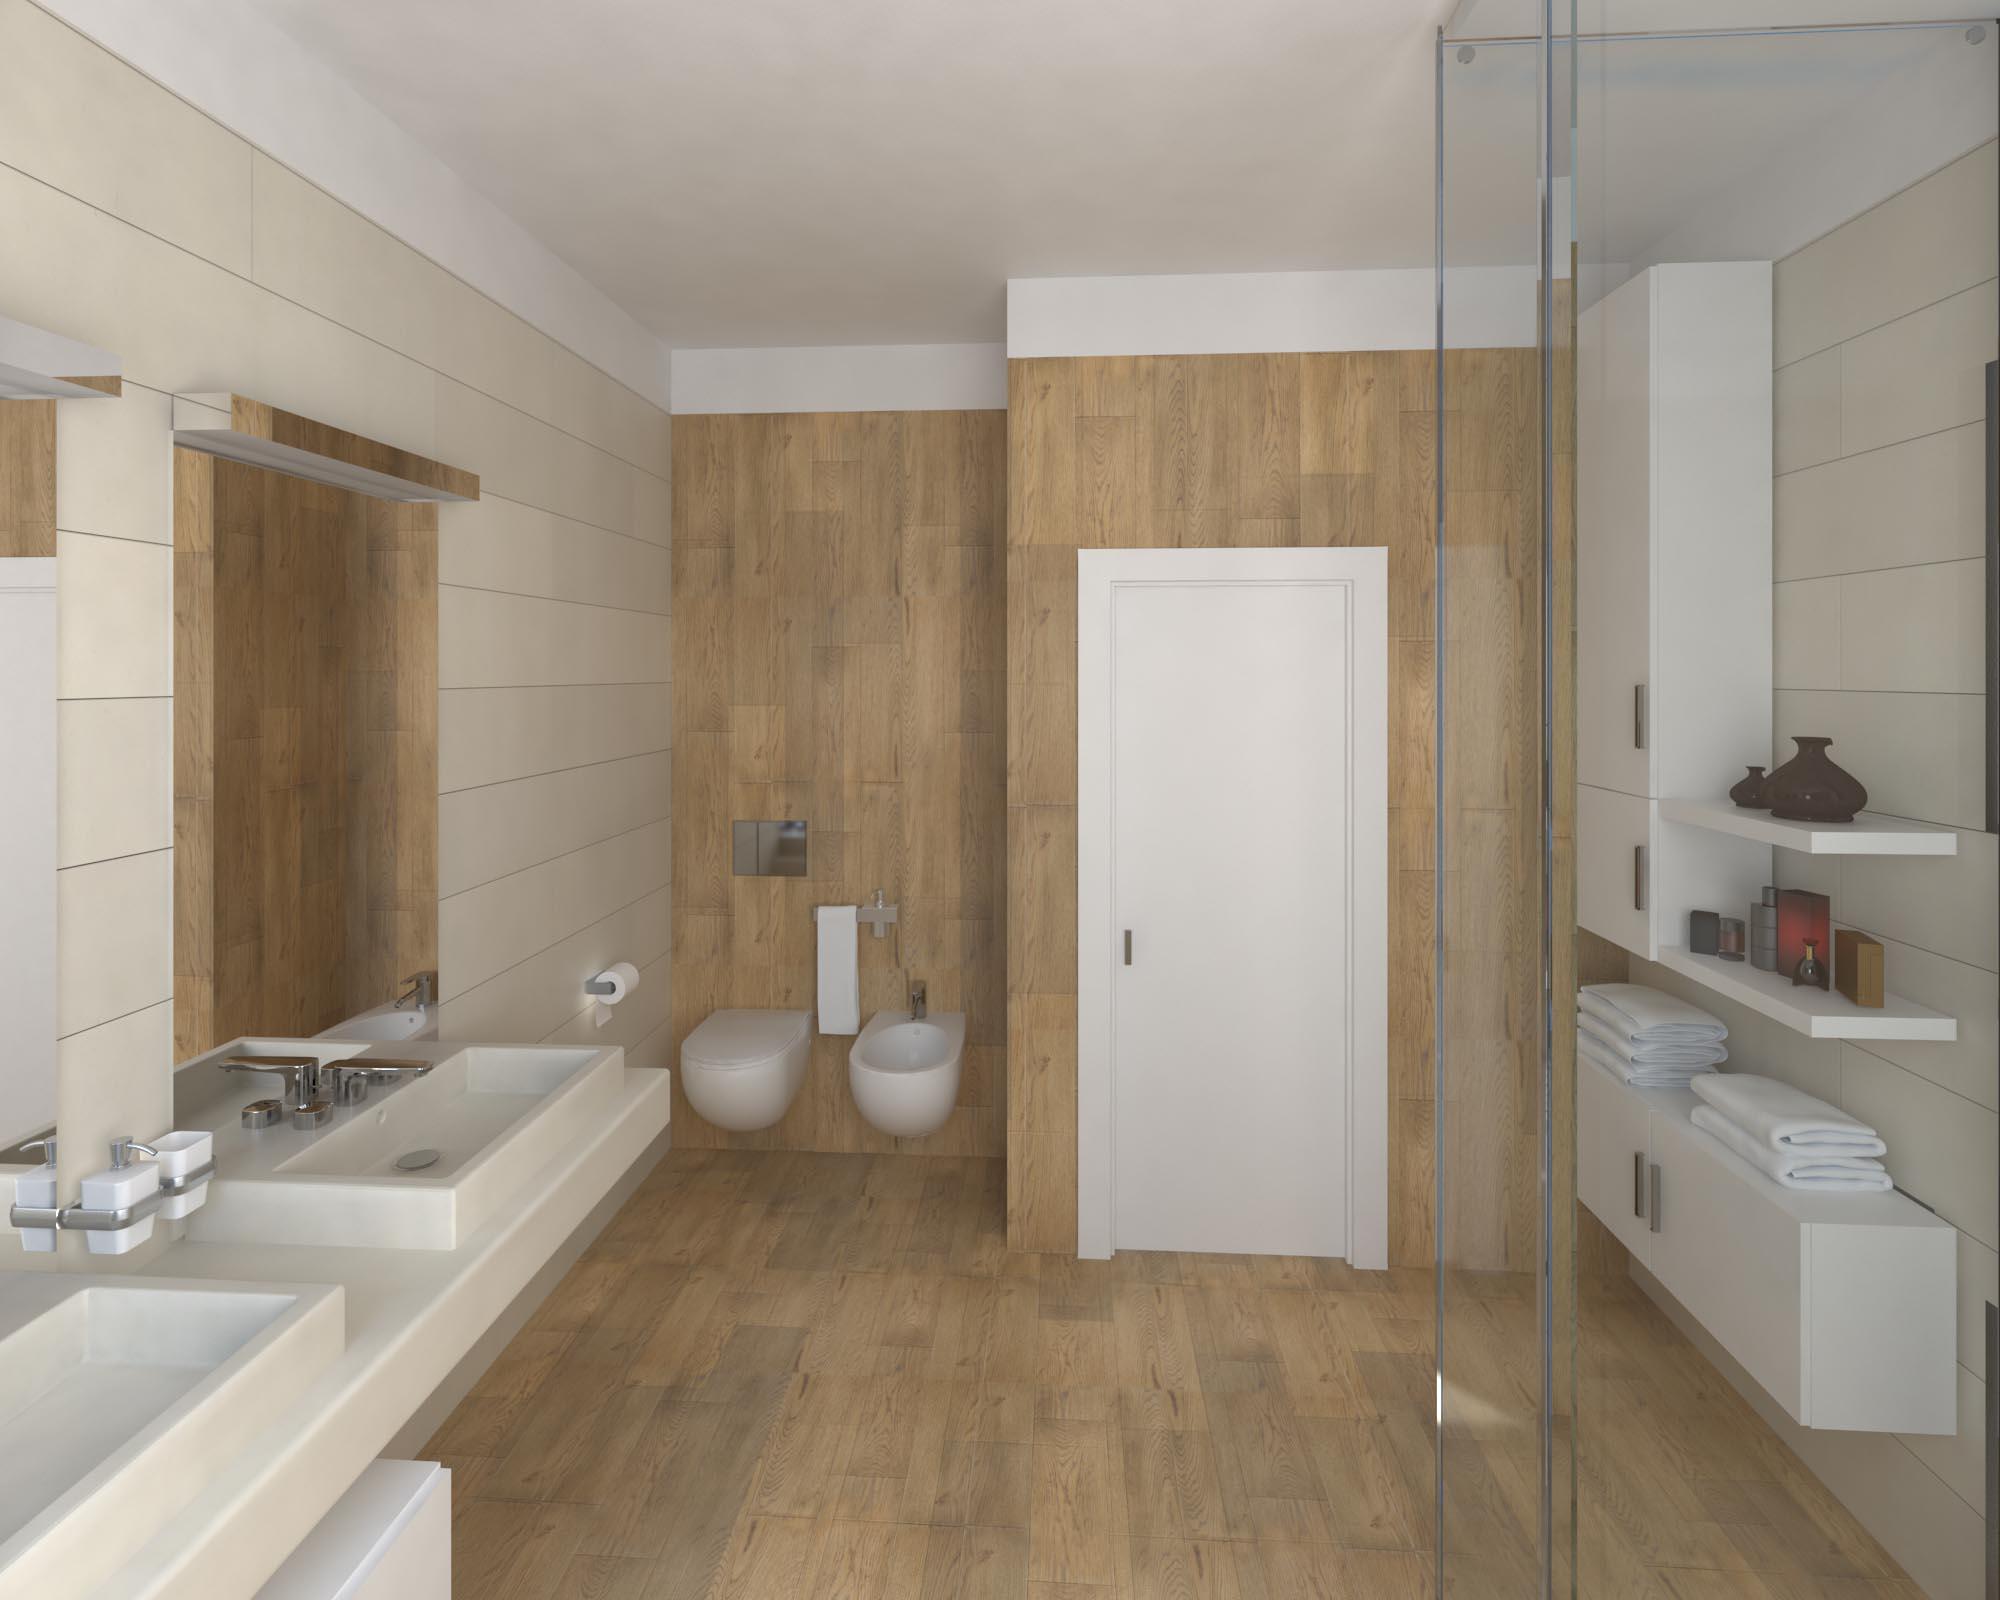 Emejing Bagno In Marmo Travertino Gallery - New Home Design 2018 ...